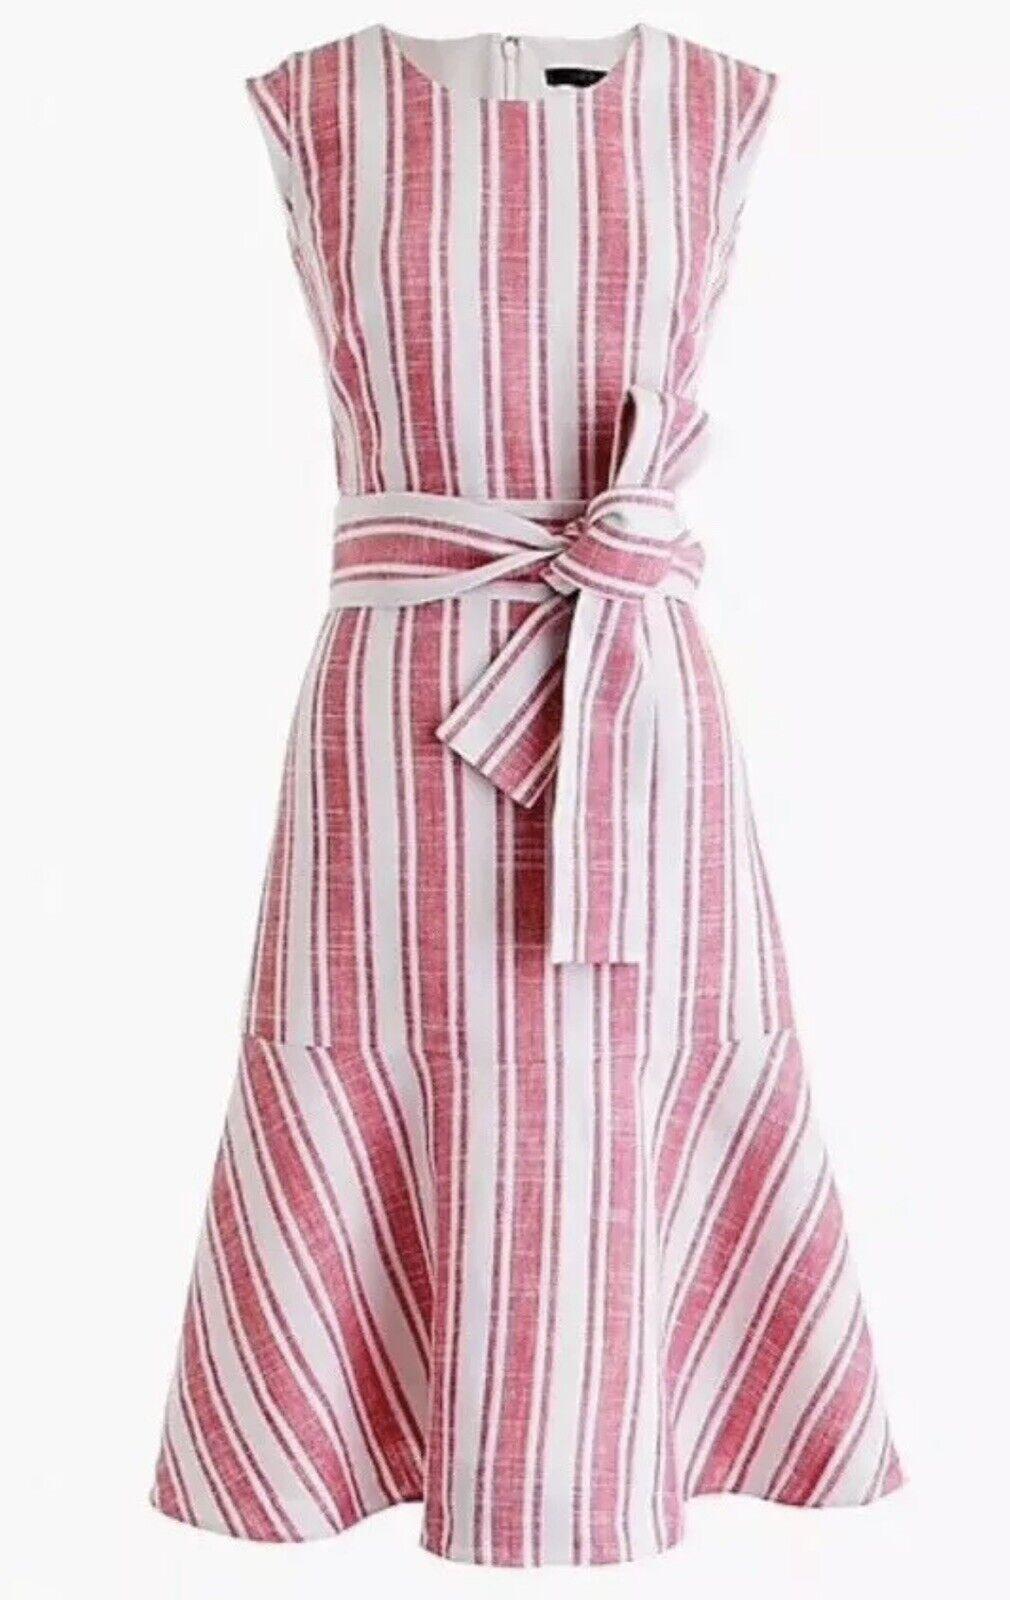 J. Crew ceinturée robe en lin, Rose